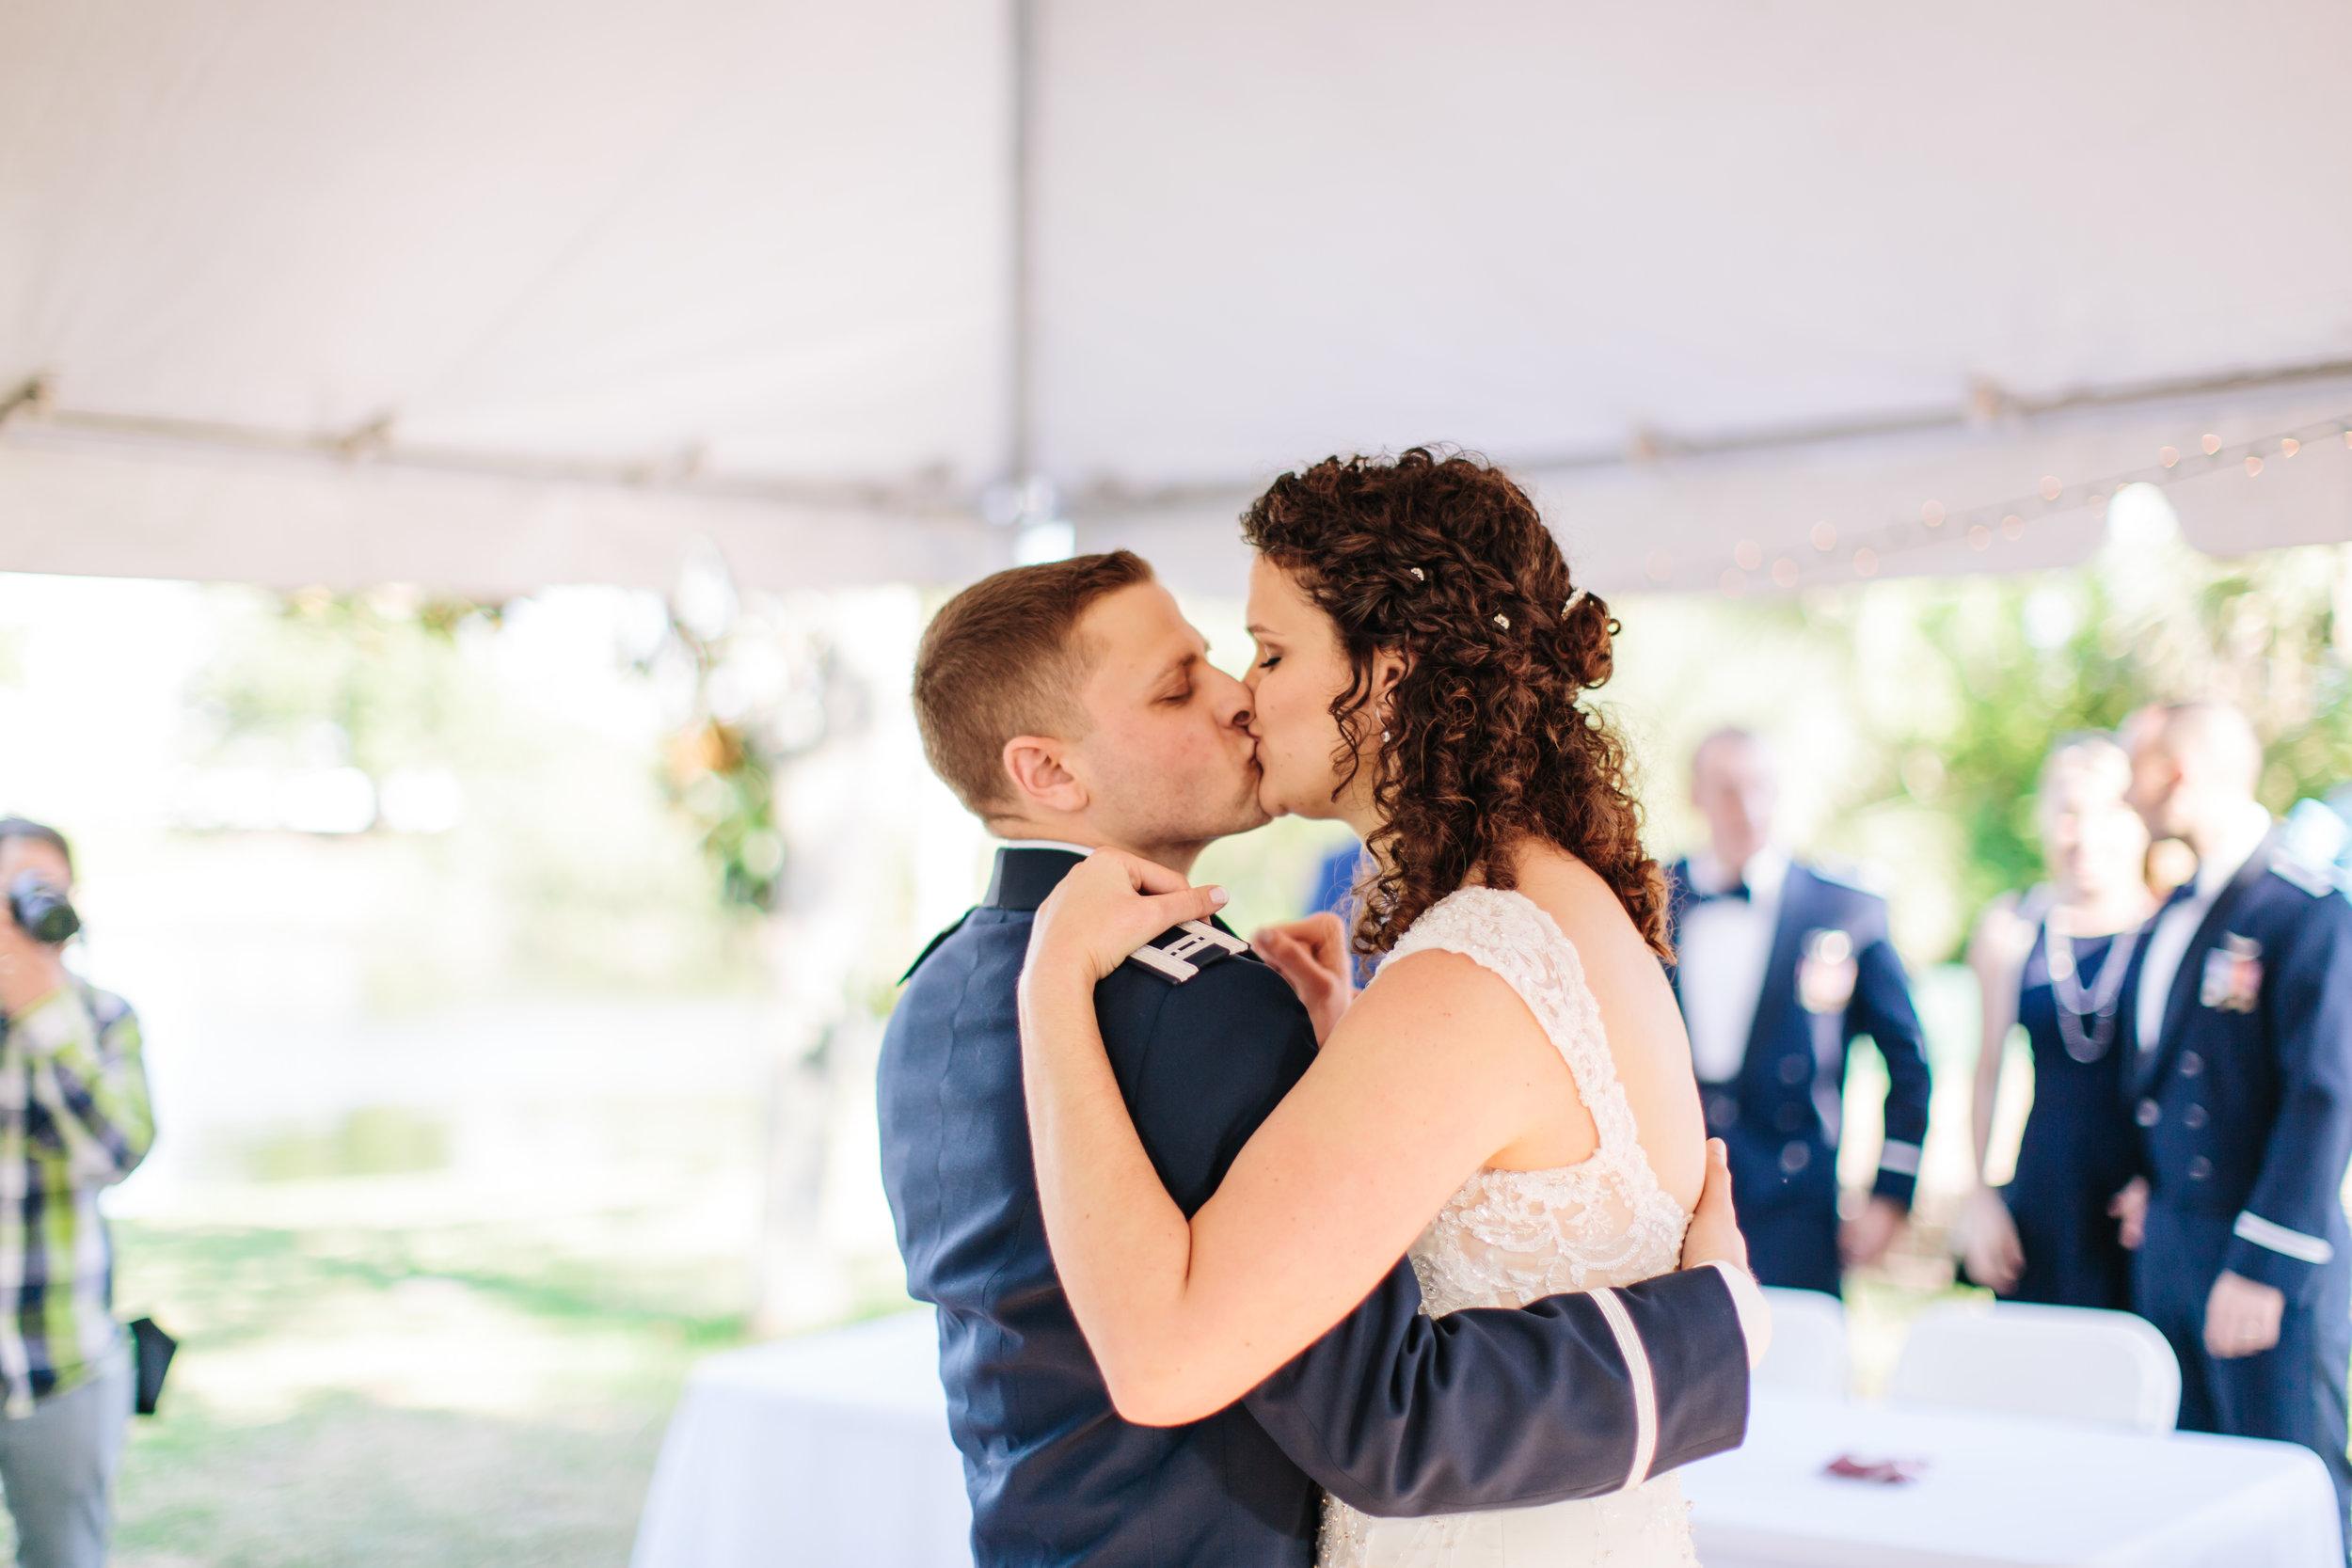 2018.03.17 Allison and Chuck Wedding Waelti Melbourne (552 of 569).jpg